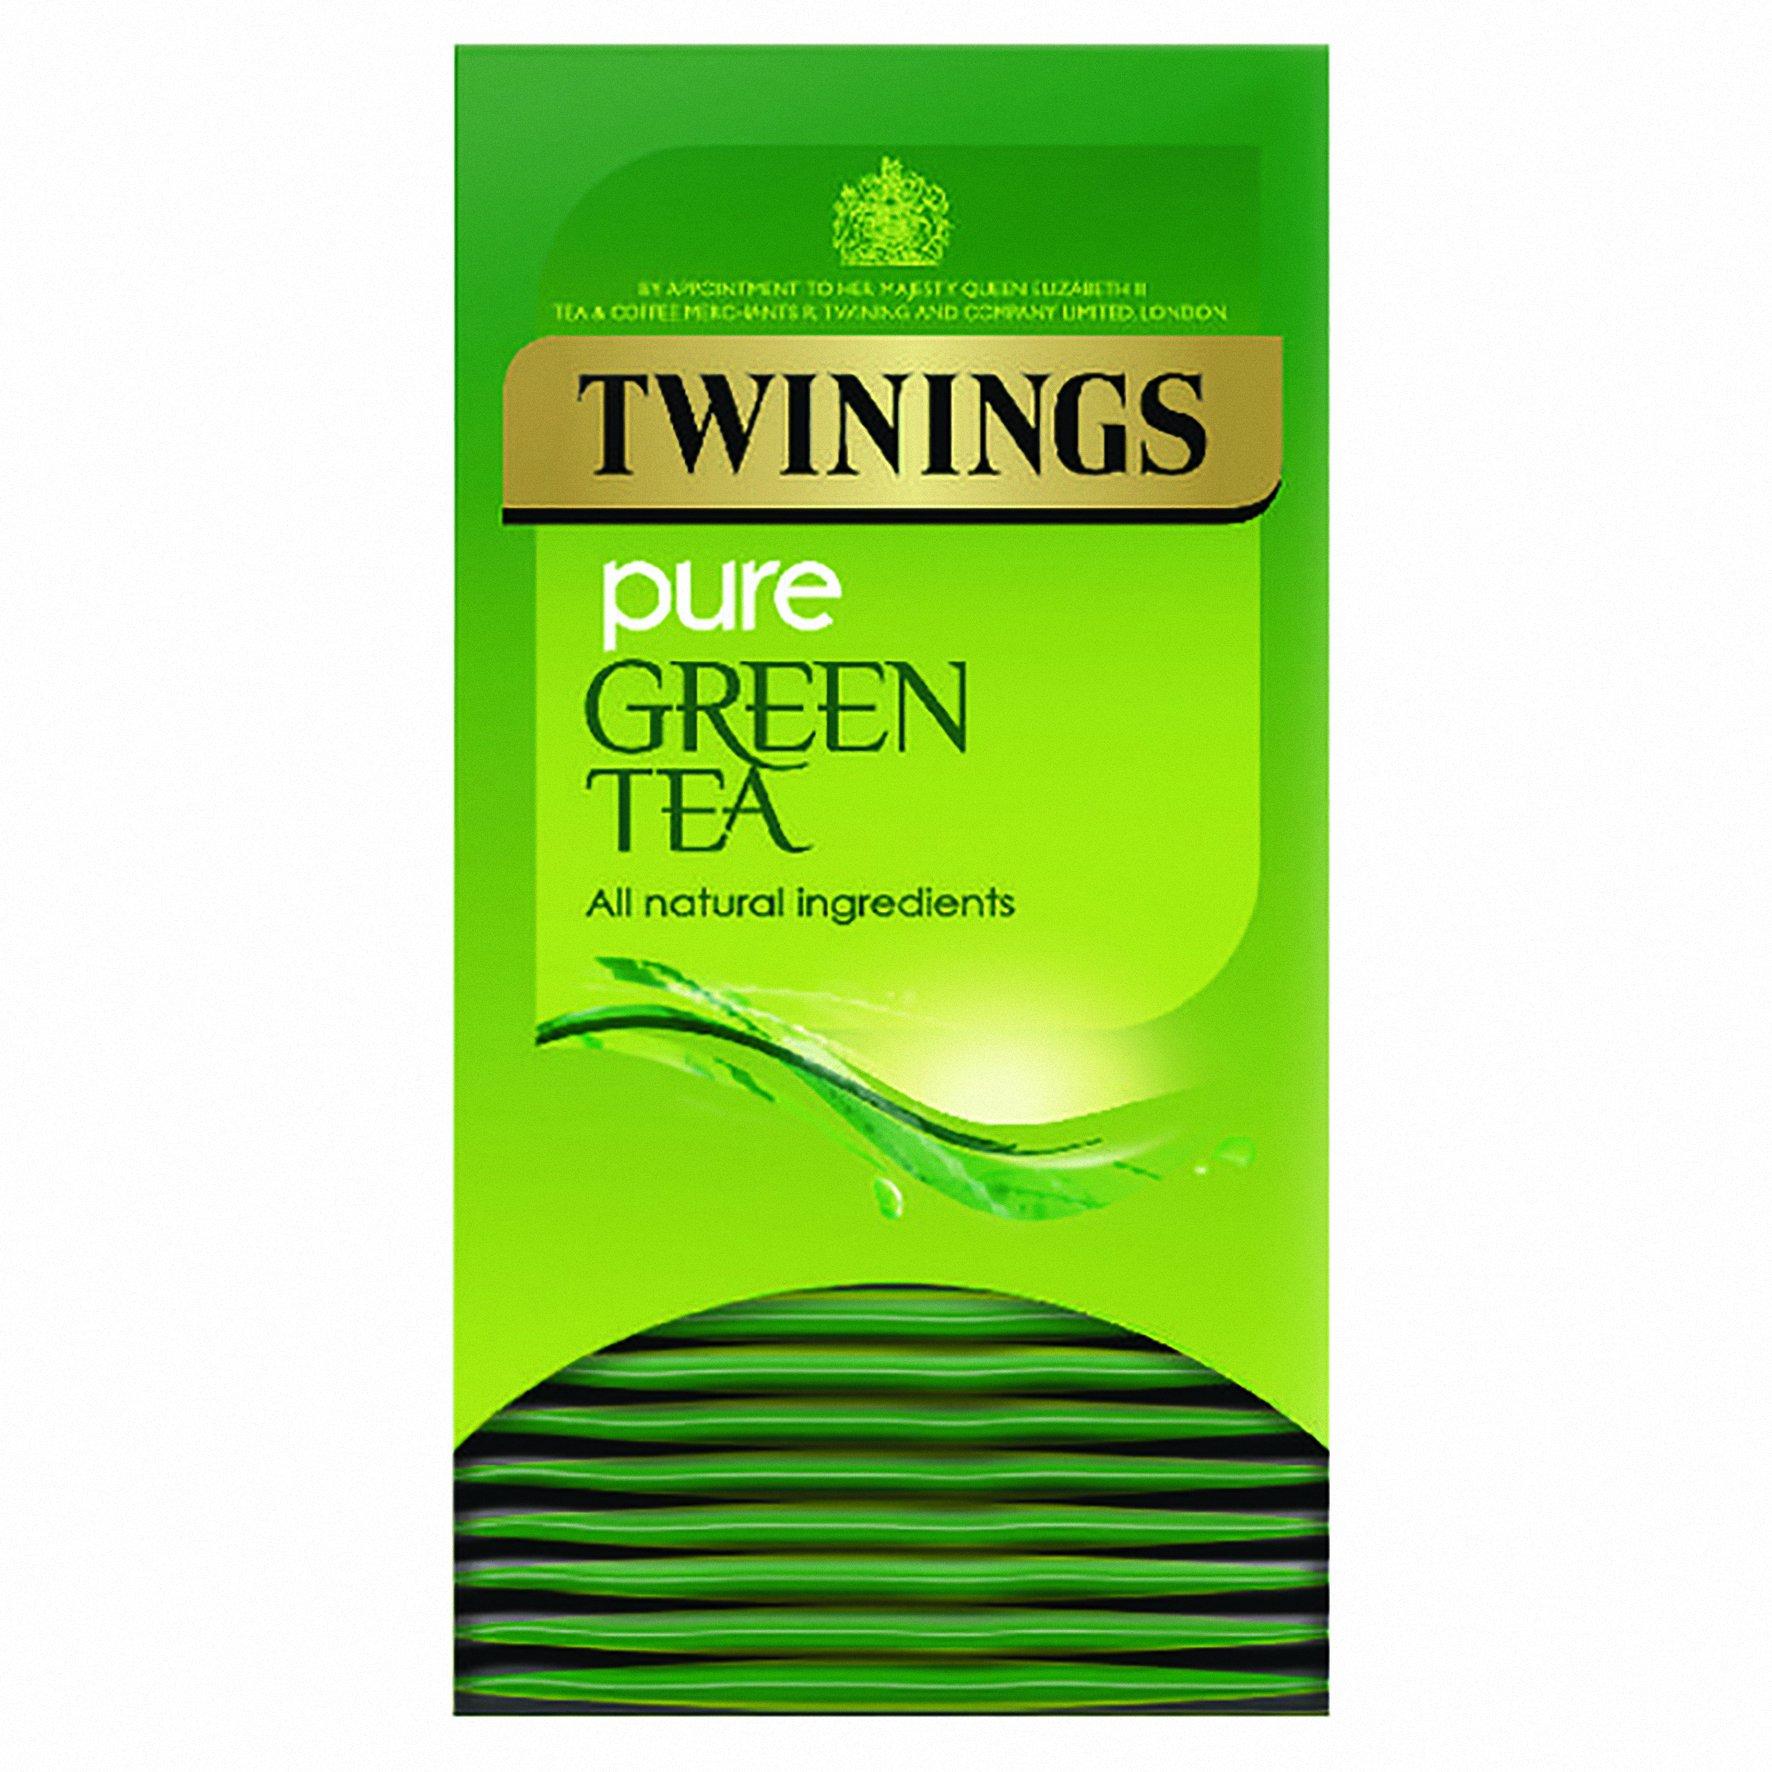 Twinings Pure Green Tea (20)